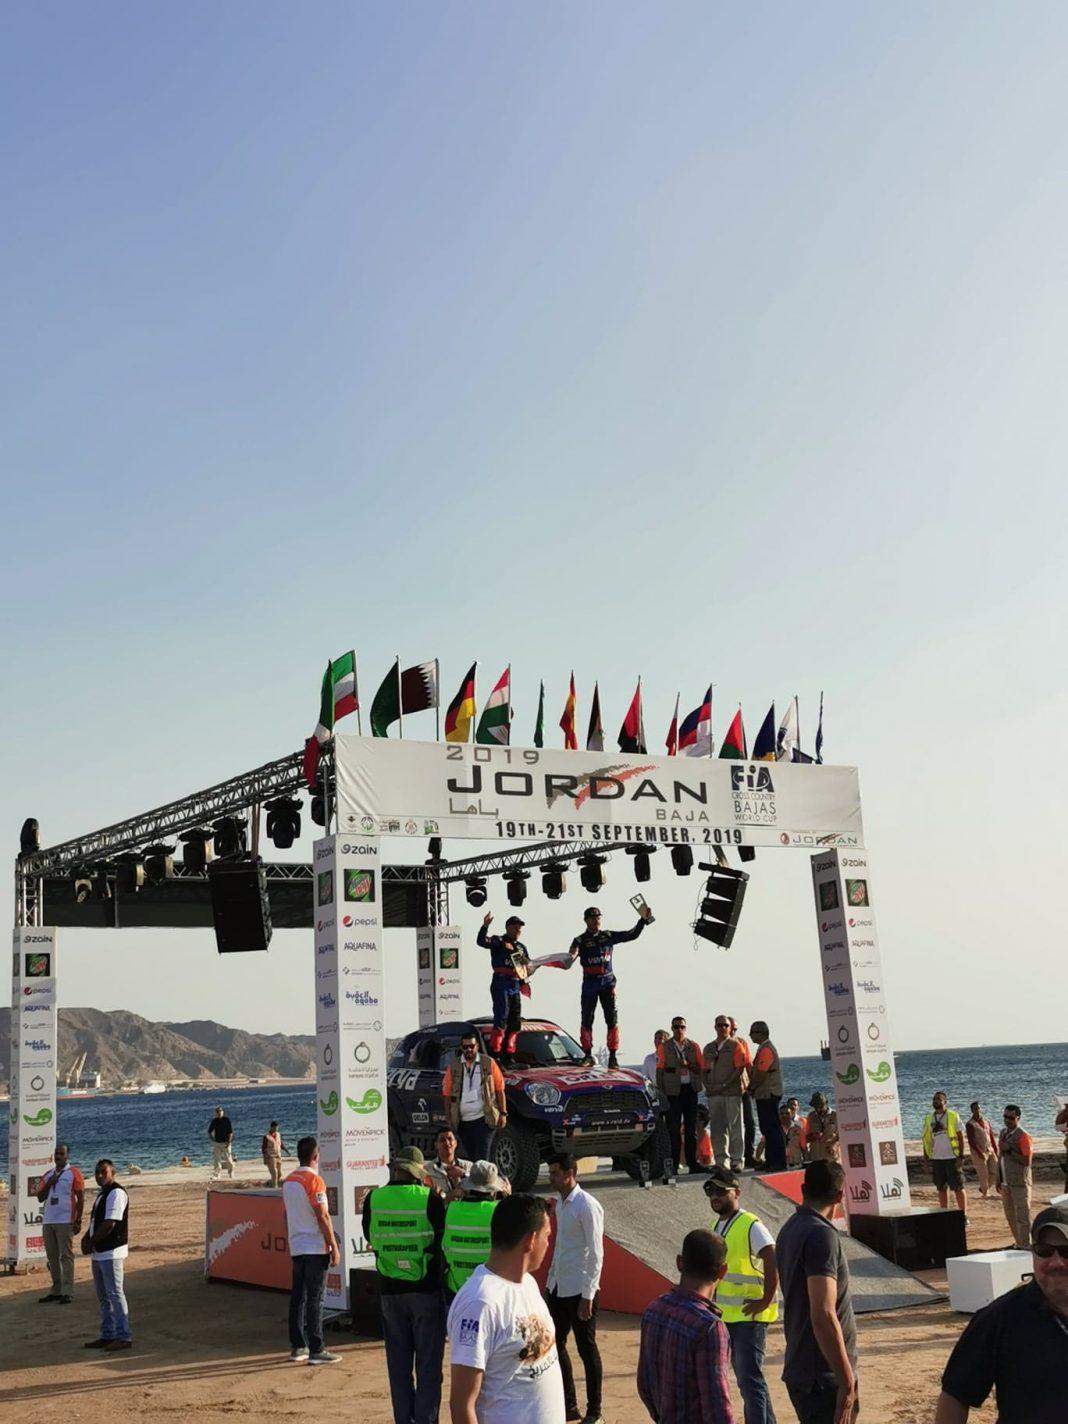 71865883_824038944679478_4413151906789064704_n-1068x1424 Jakub Przygonski castiga prima editie Jordan Baja